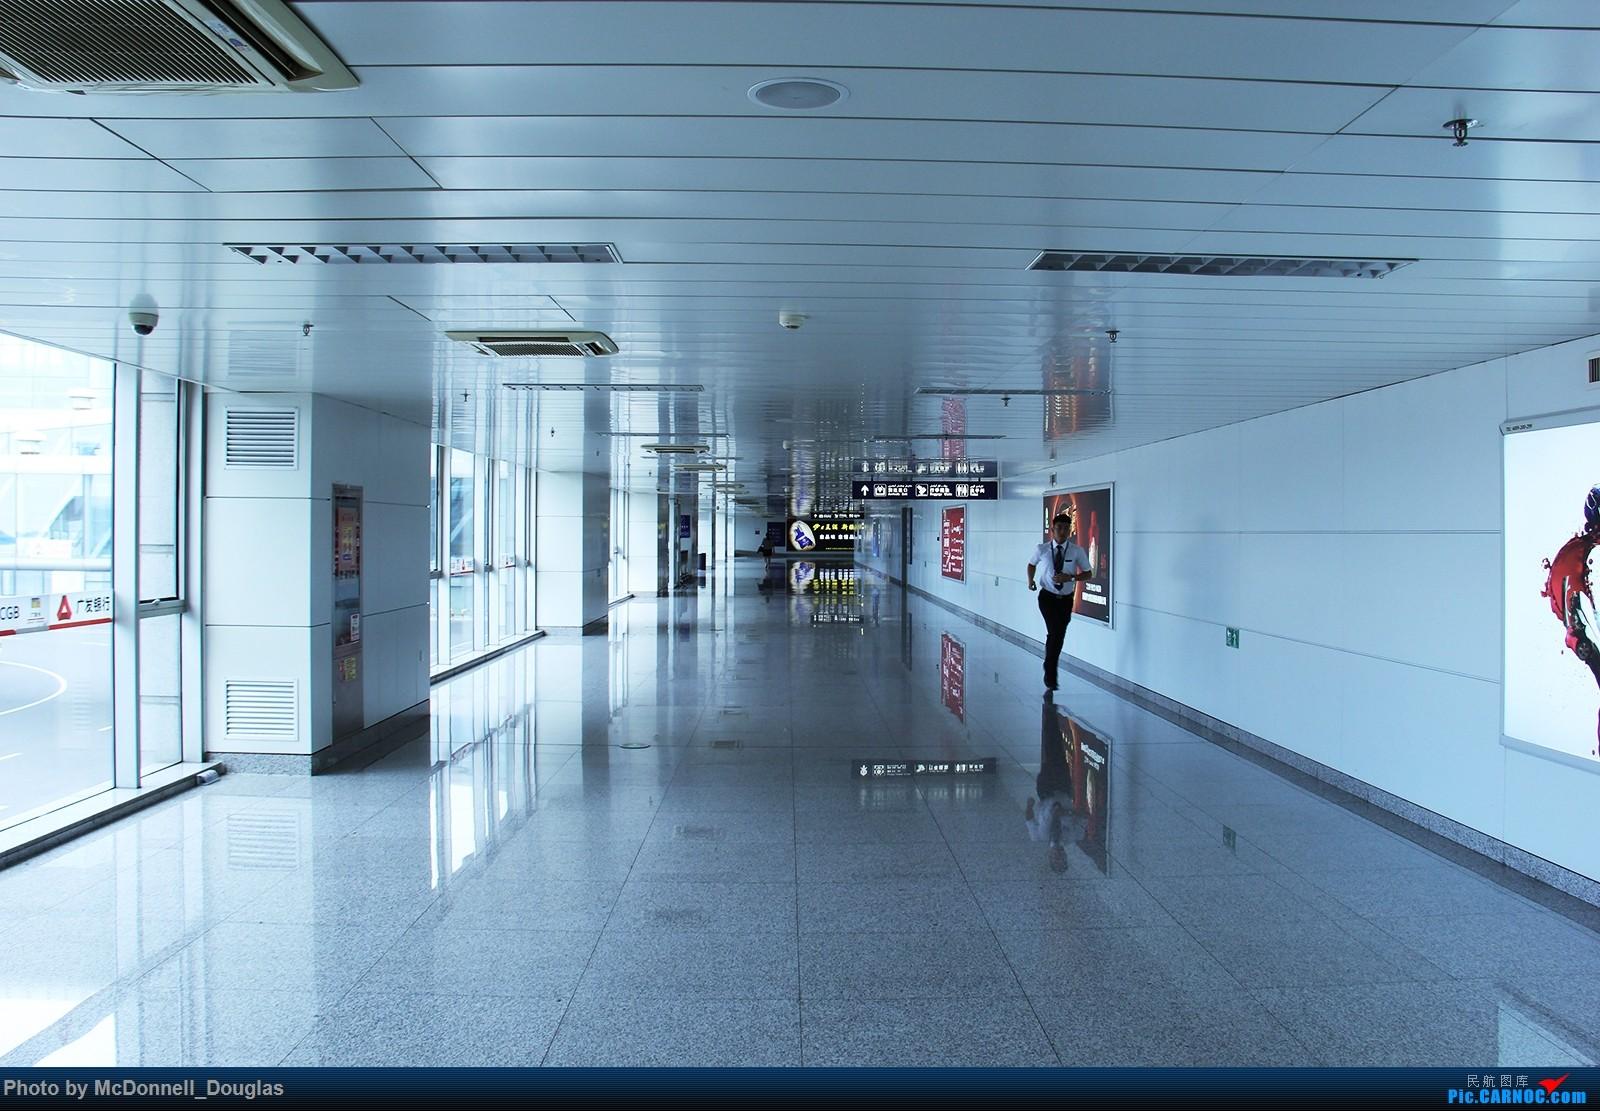 Re:[原创]【上海飞友会】【zc带你走天下(3)】再访祖辈年轻时工作的土地,父母年少时生活戈壁,跨越大半个中国去看新疆,回程小游蓉城(下) EMBRAER ERJ-190LR B-3147 中国乌鲁木齐地窝堡国际机场 中国乌鲁木齐地窝堡国际机场